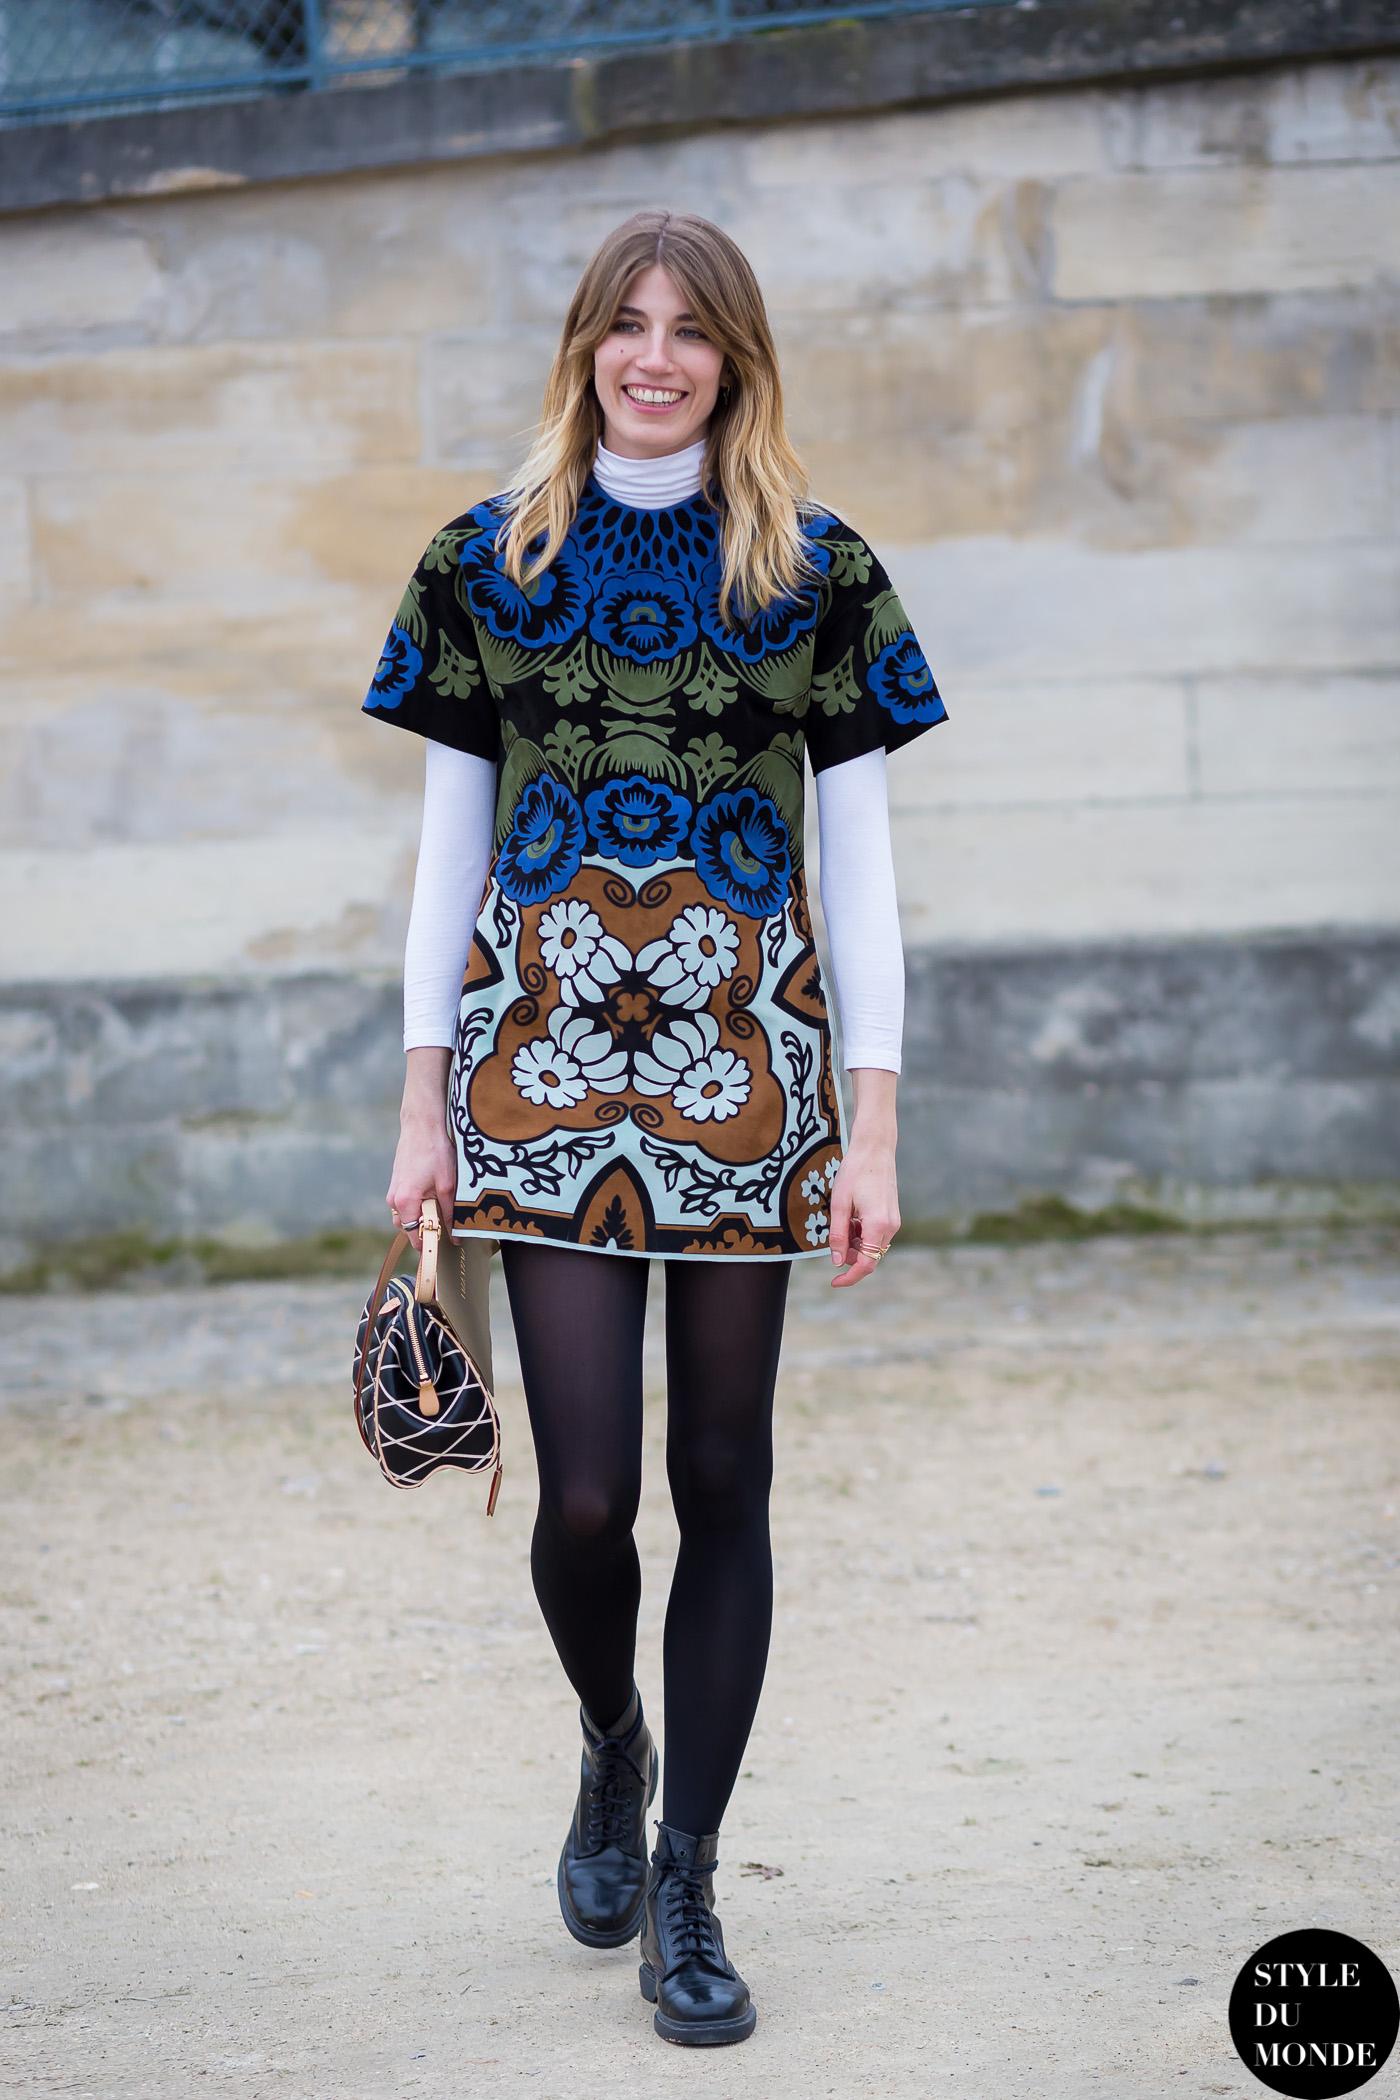 Paris Fashion Week Fw 2015 Street Style Veronika